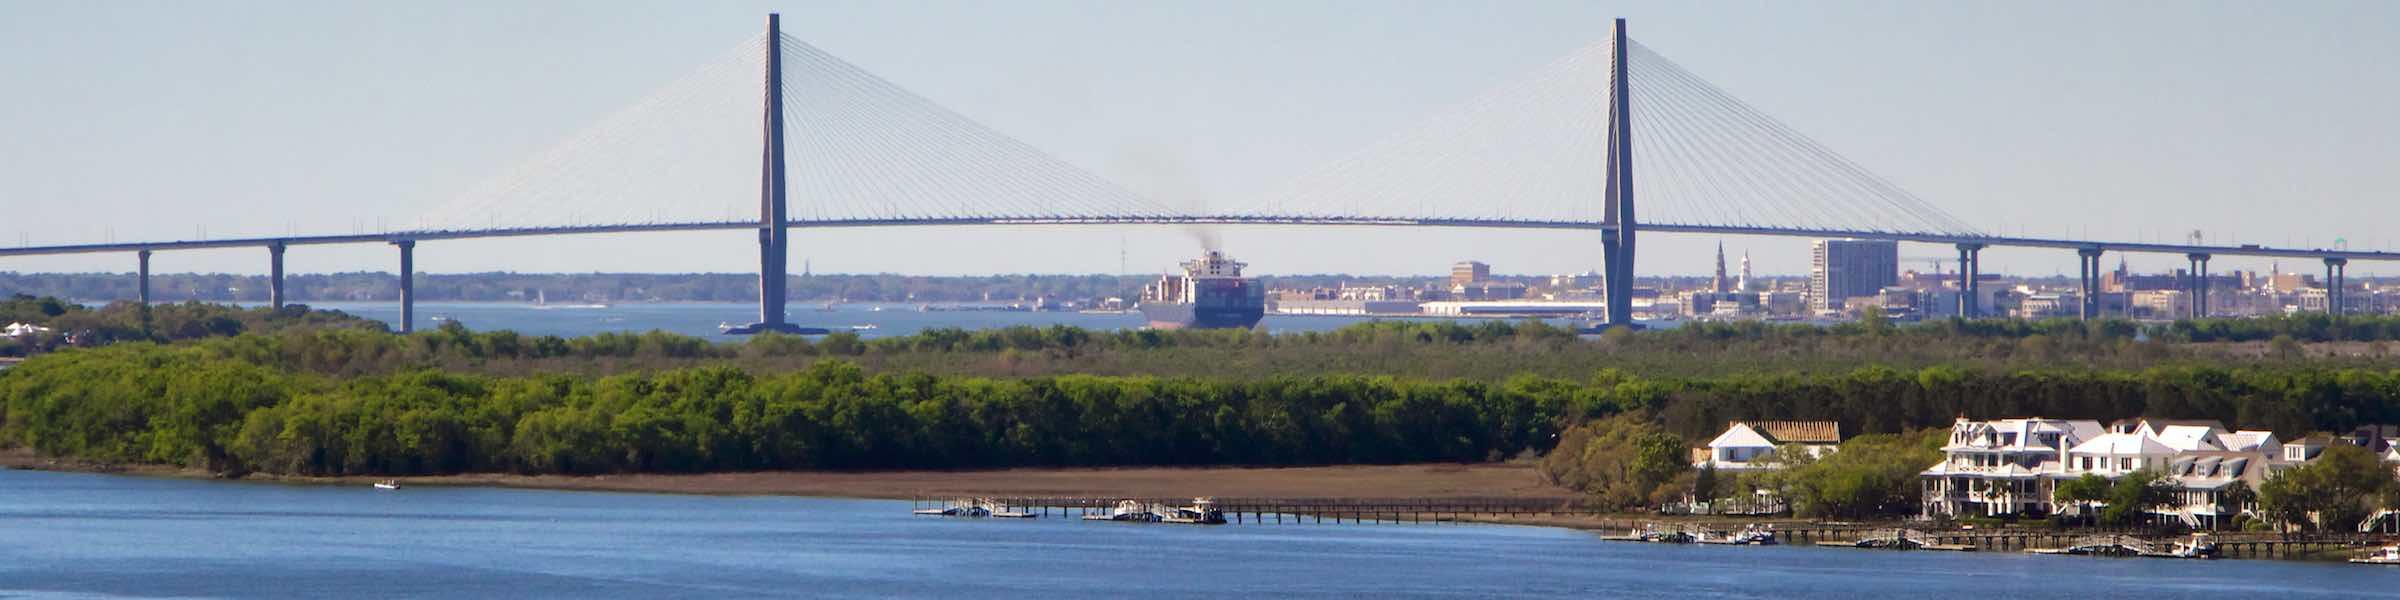 The Ravenel Bridge, Charleston, SC.